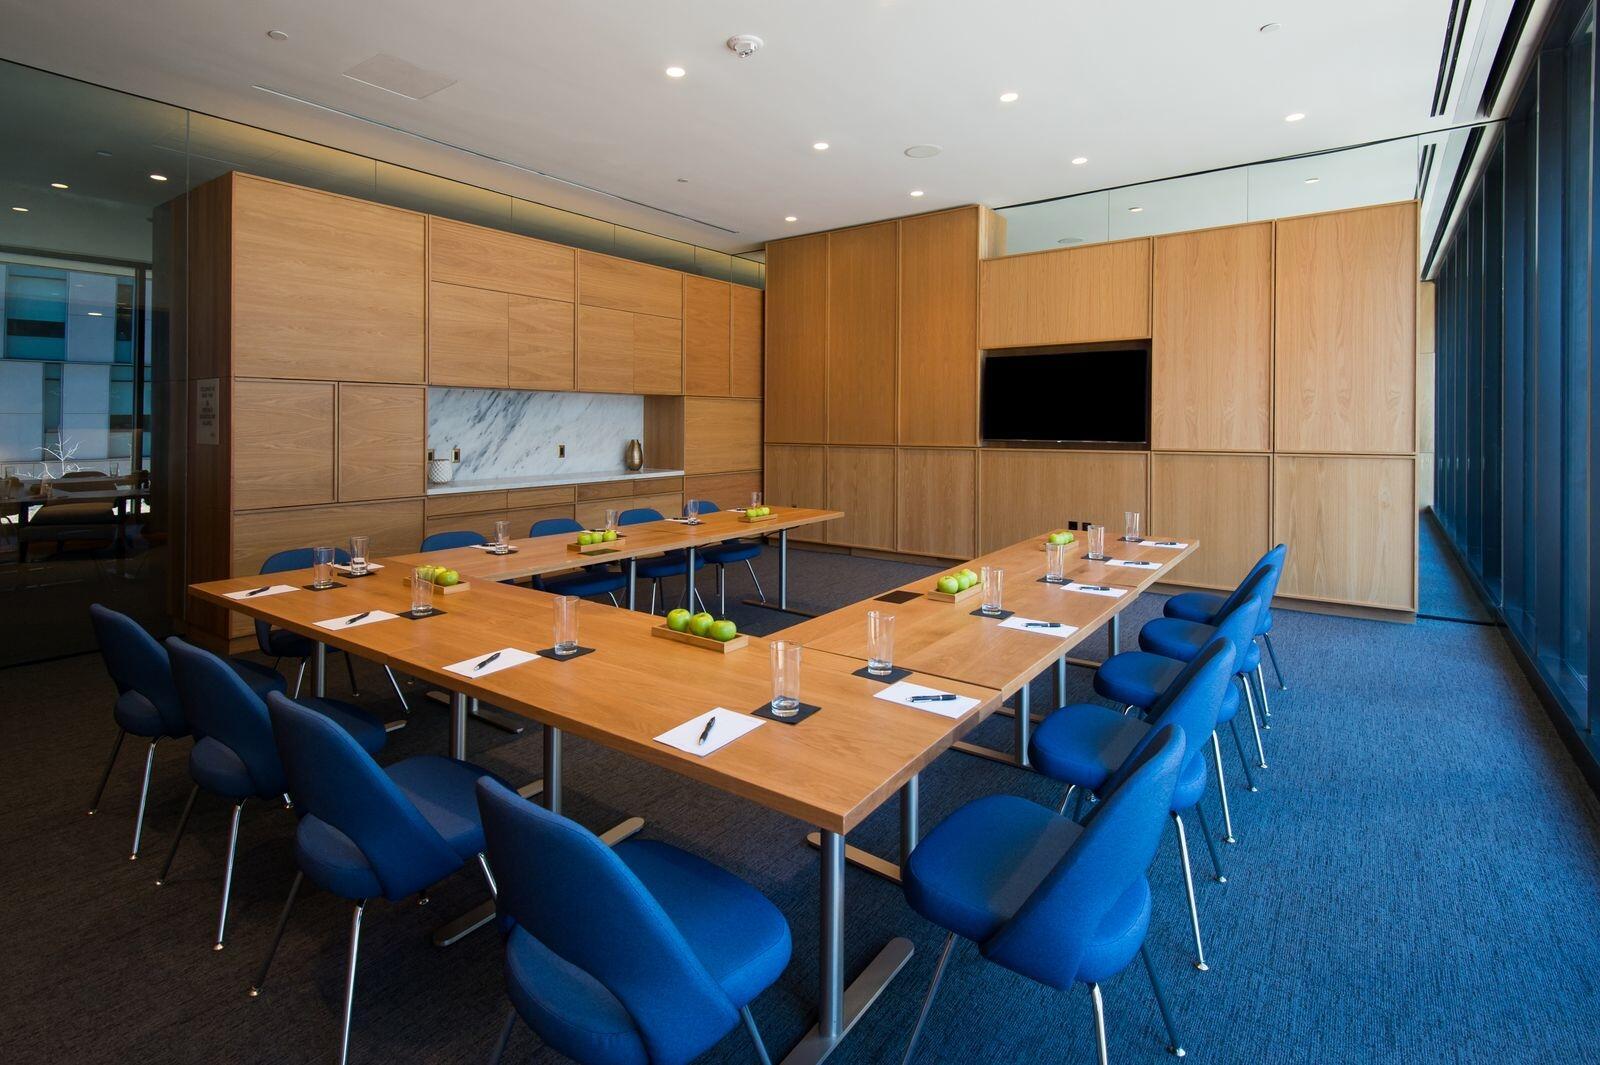 Meeting room with tables set u-shape